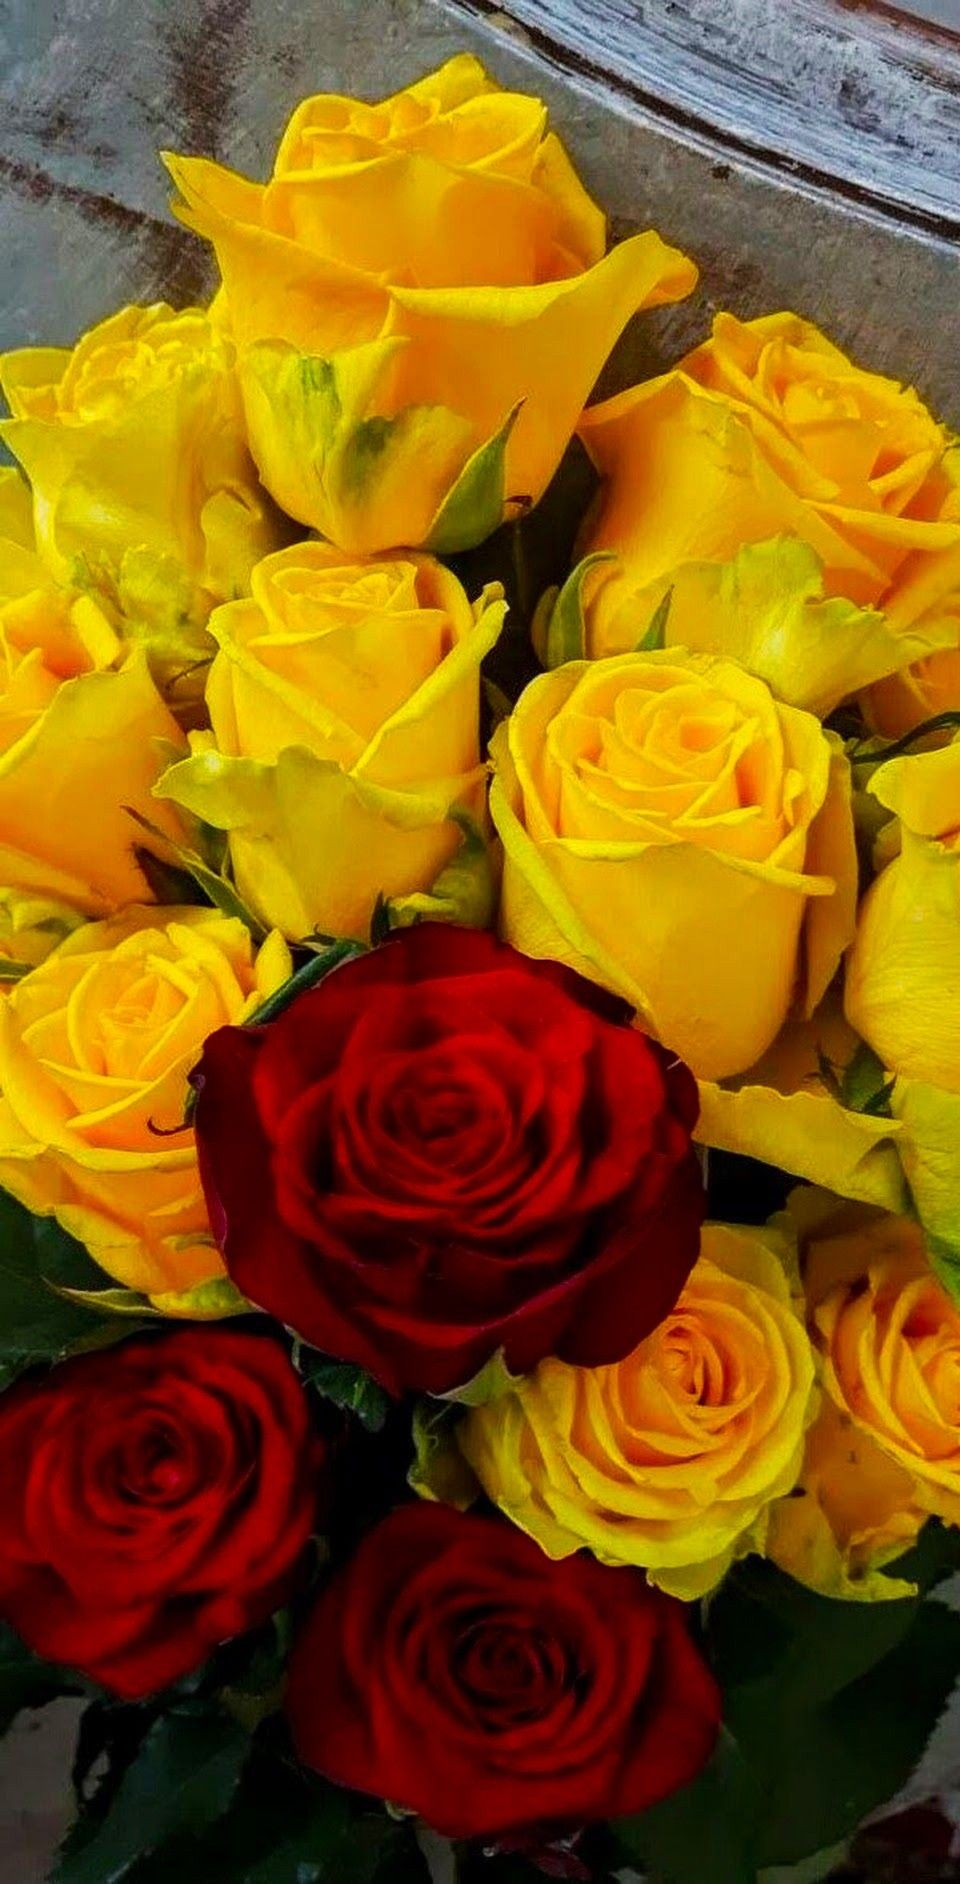 Pin De Bowz2men Em Roses Em 2020 Flores Maravilhosas Bouquets Hibisco